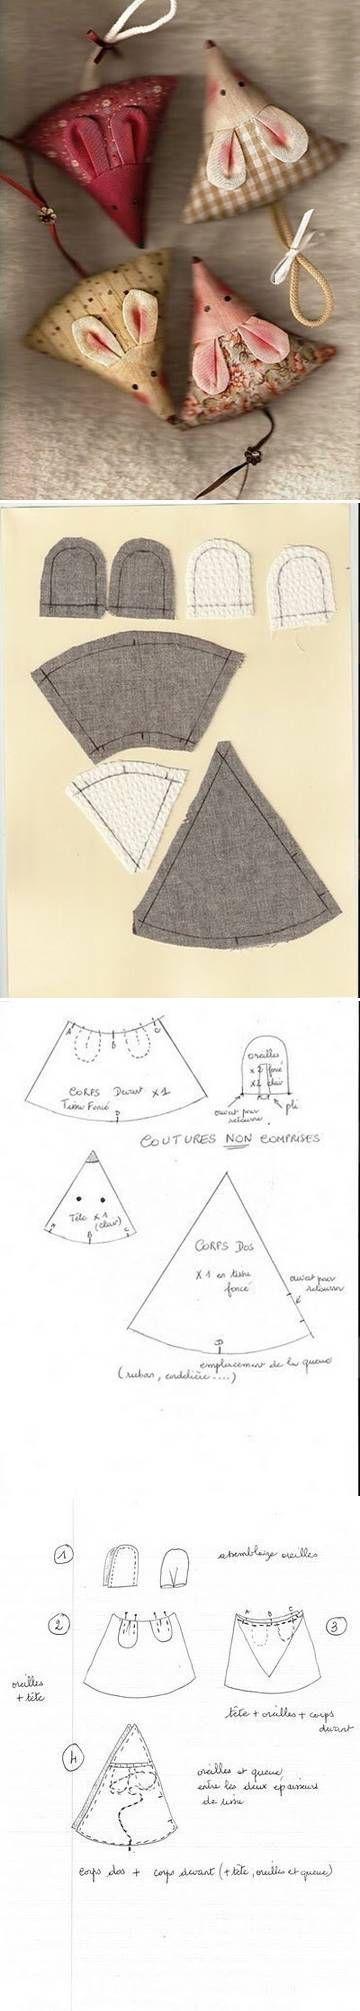 DIY Cute Fabric Mice DIY Projects / UsefulDIY.com